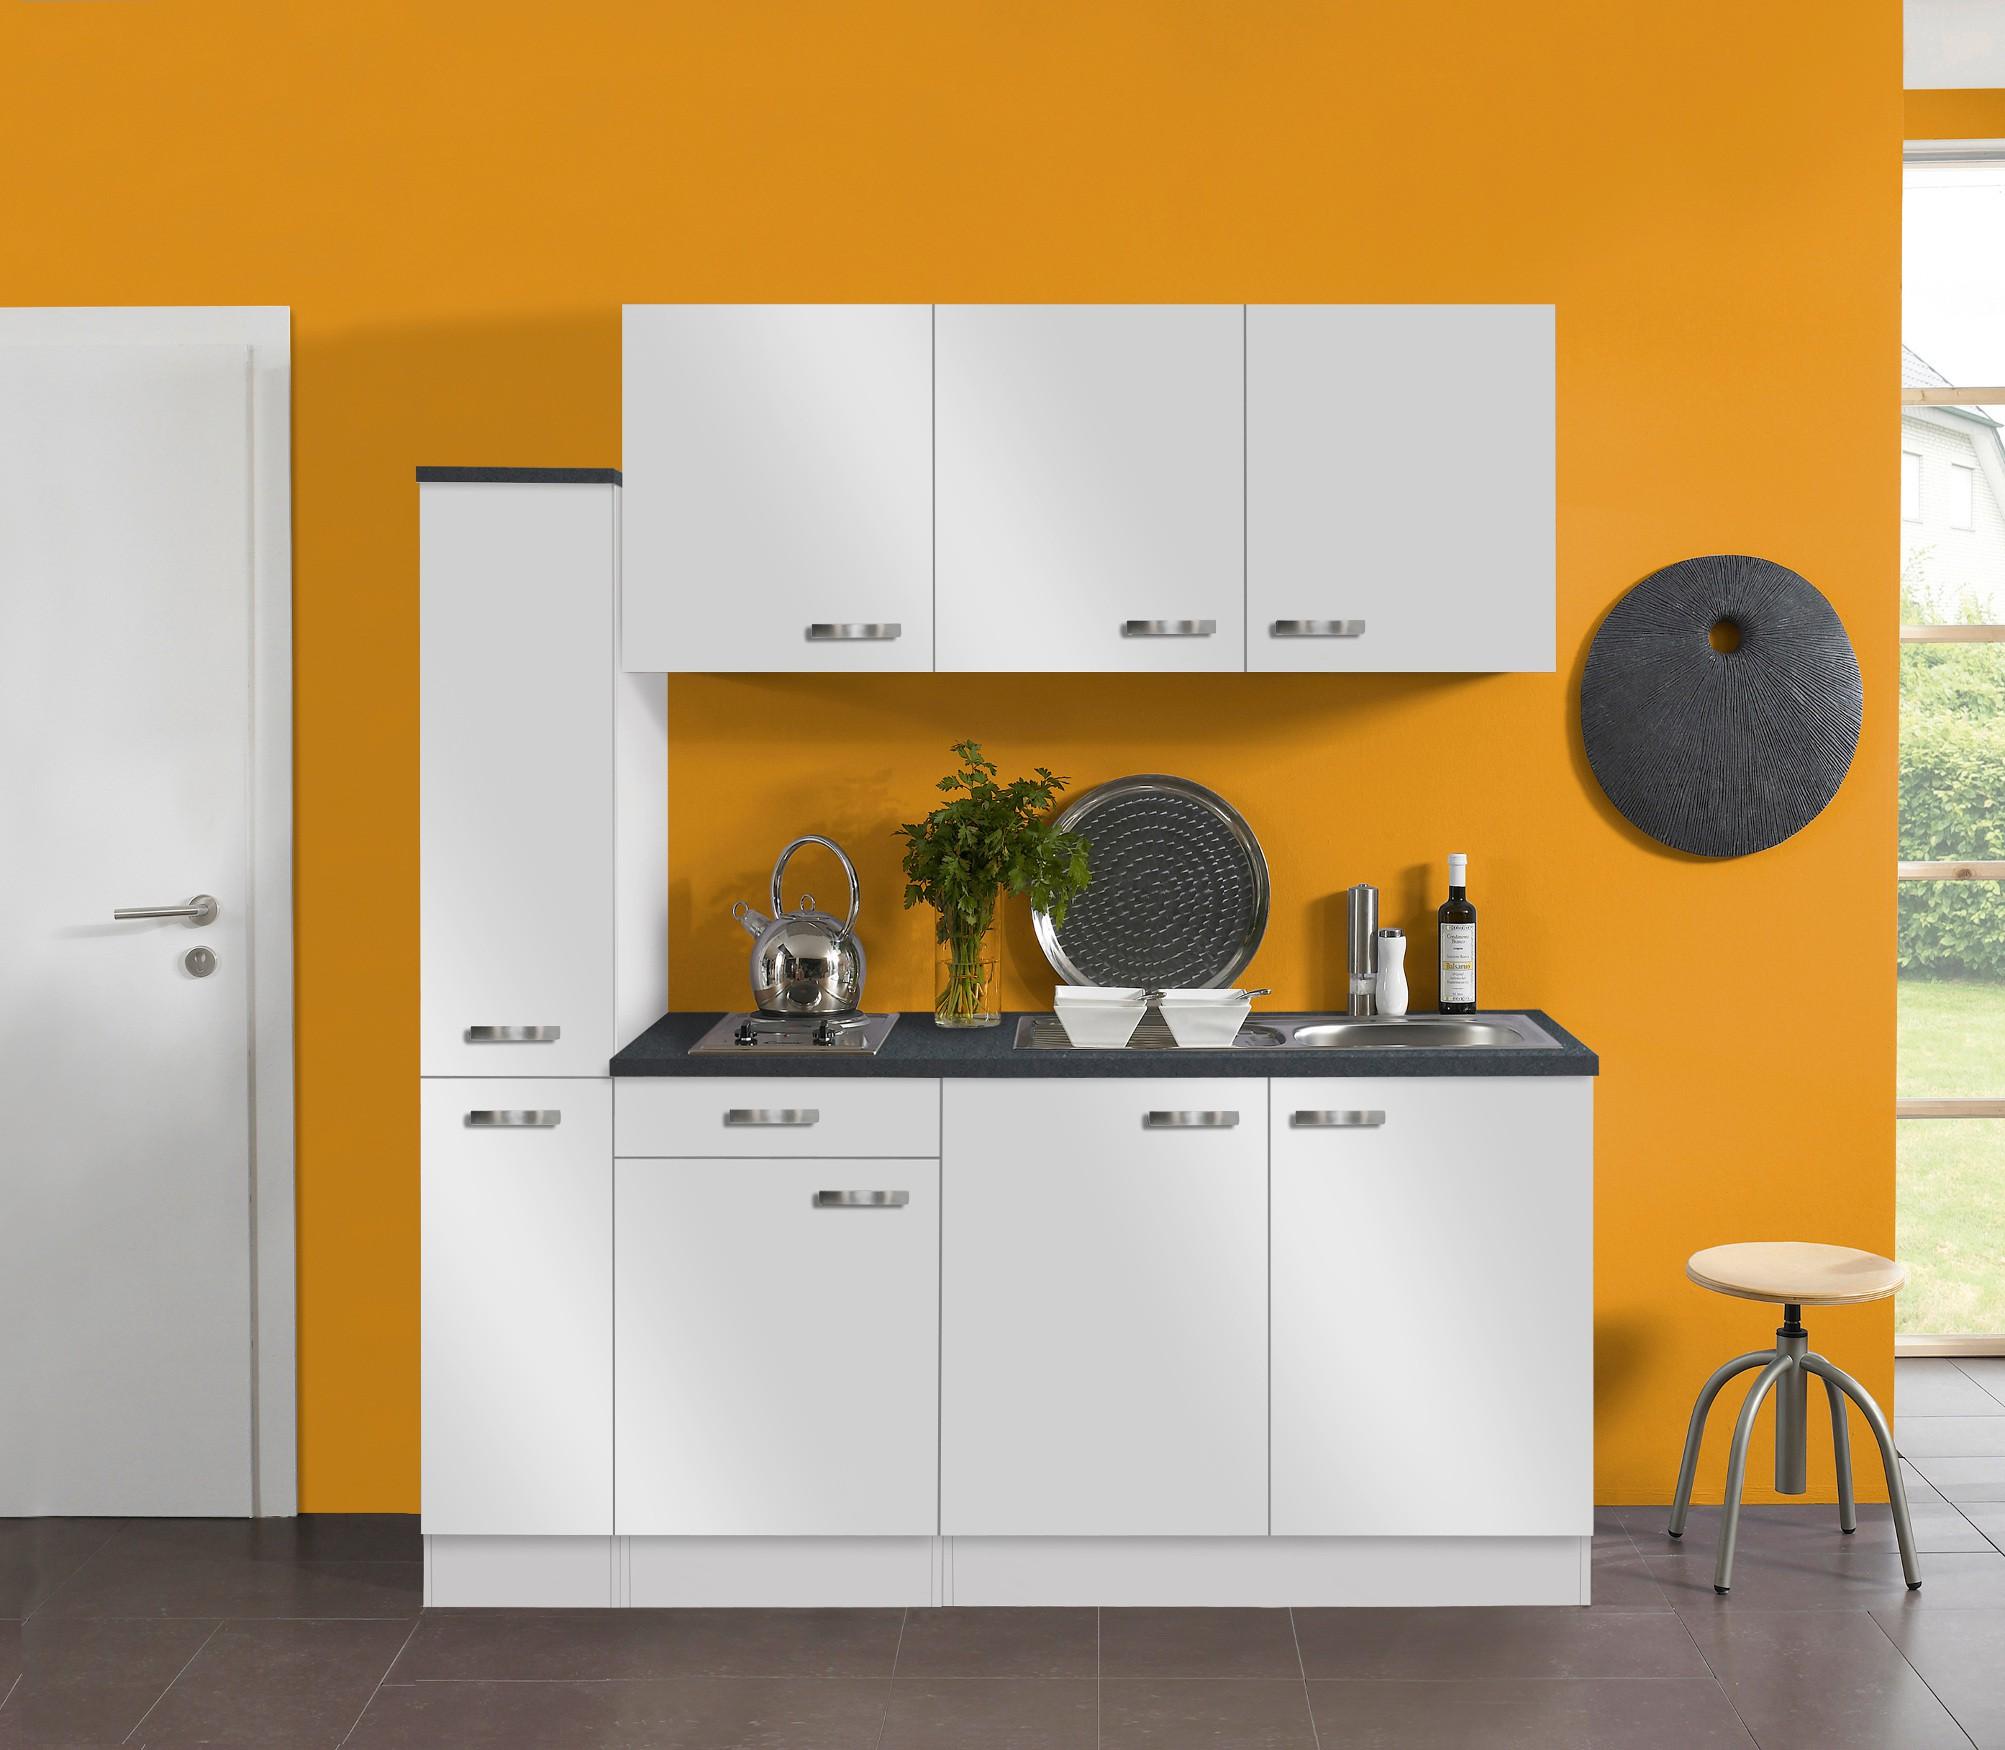 singlek che granada mit elektro kochfeld 8 teilig breite 180 cm wei k che singlek chen. Black Bedroom Furniture Sets. Home Design Ideas